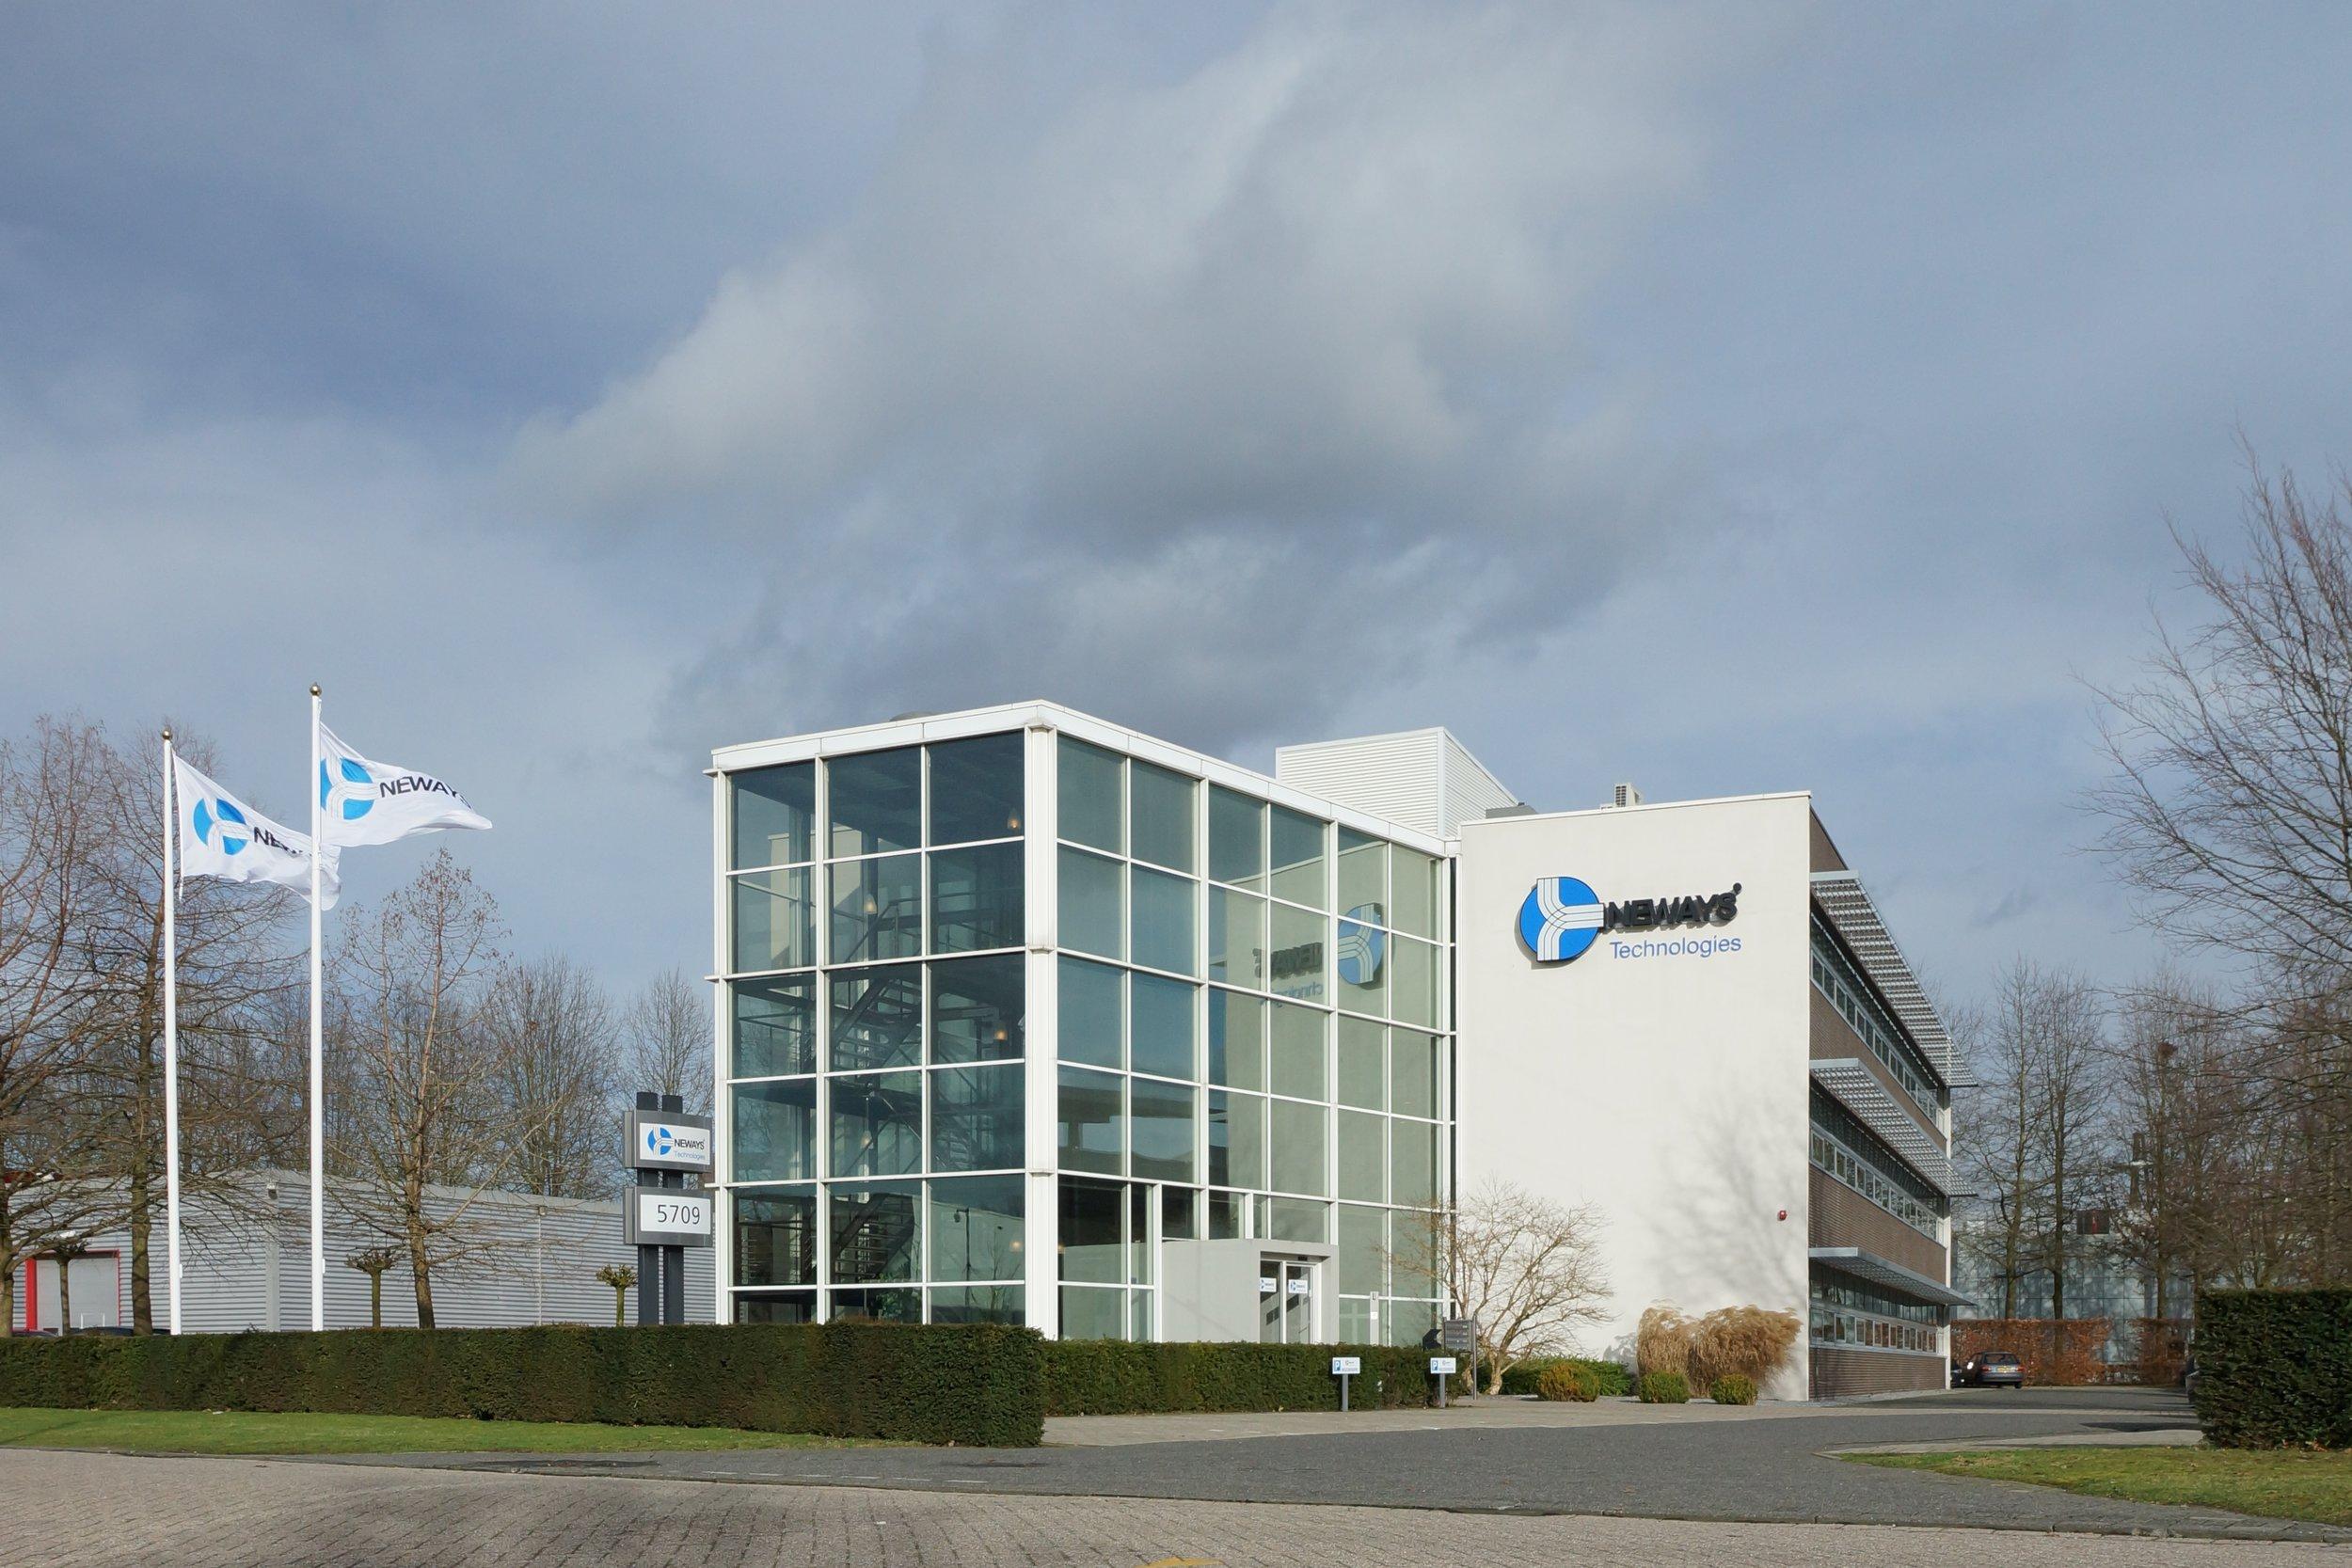 Science Park Eindhoven 5709, Son